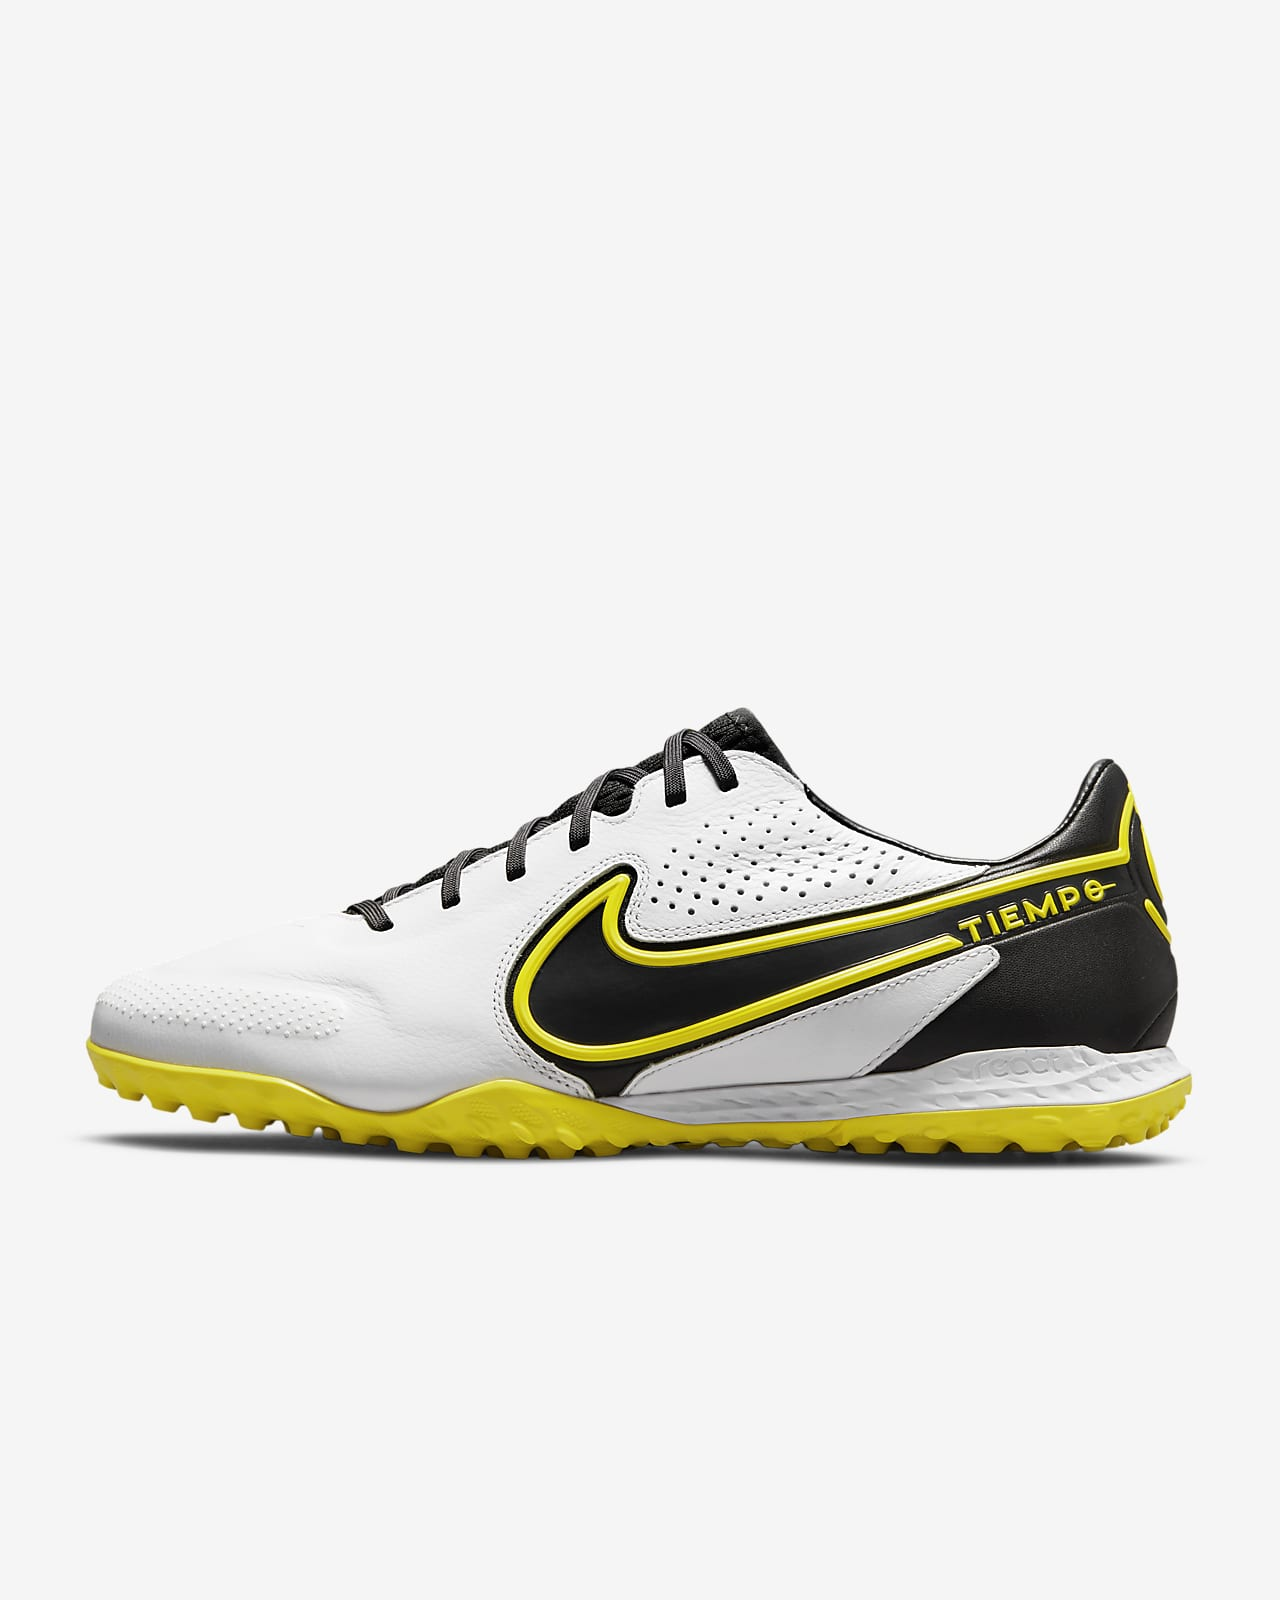 Chaussure de football pour surface synthétique Nike React Tiempo Legend9 Pro TF